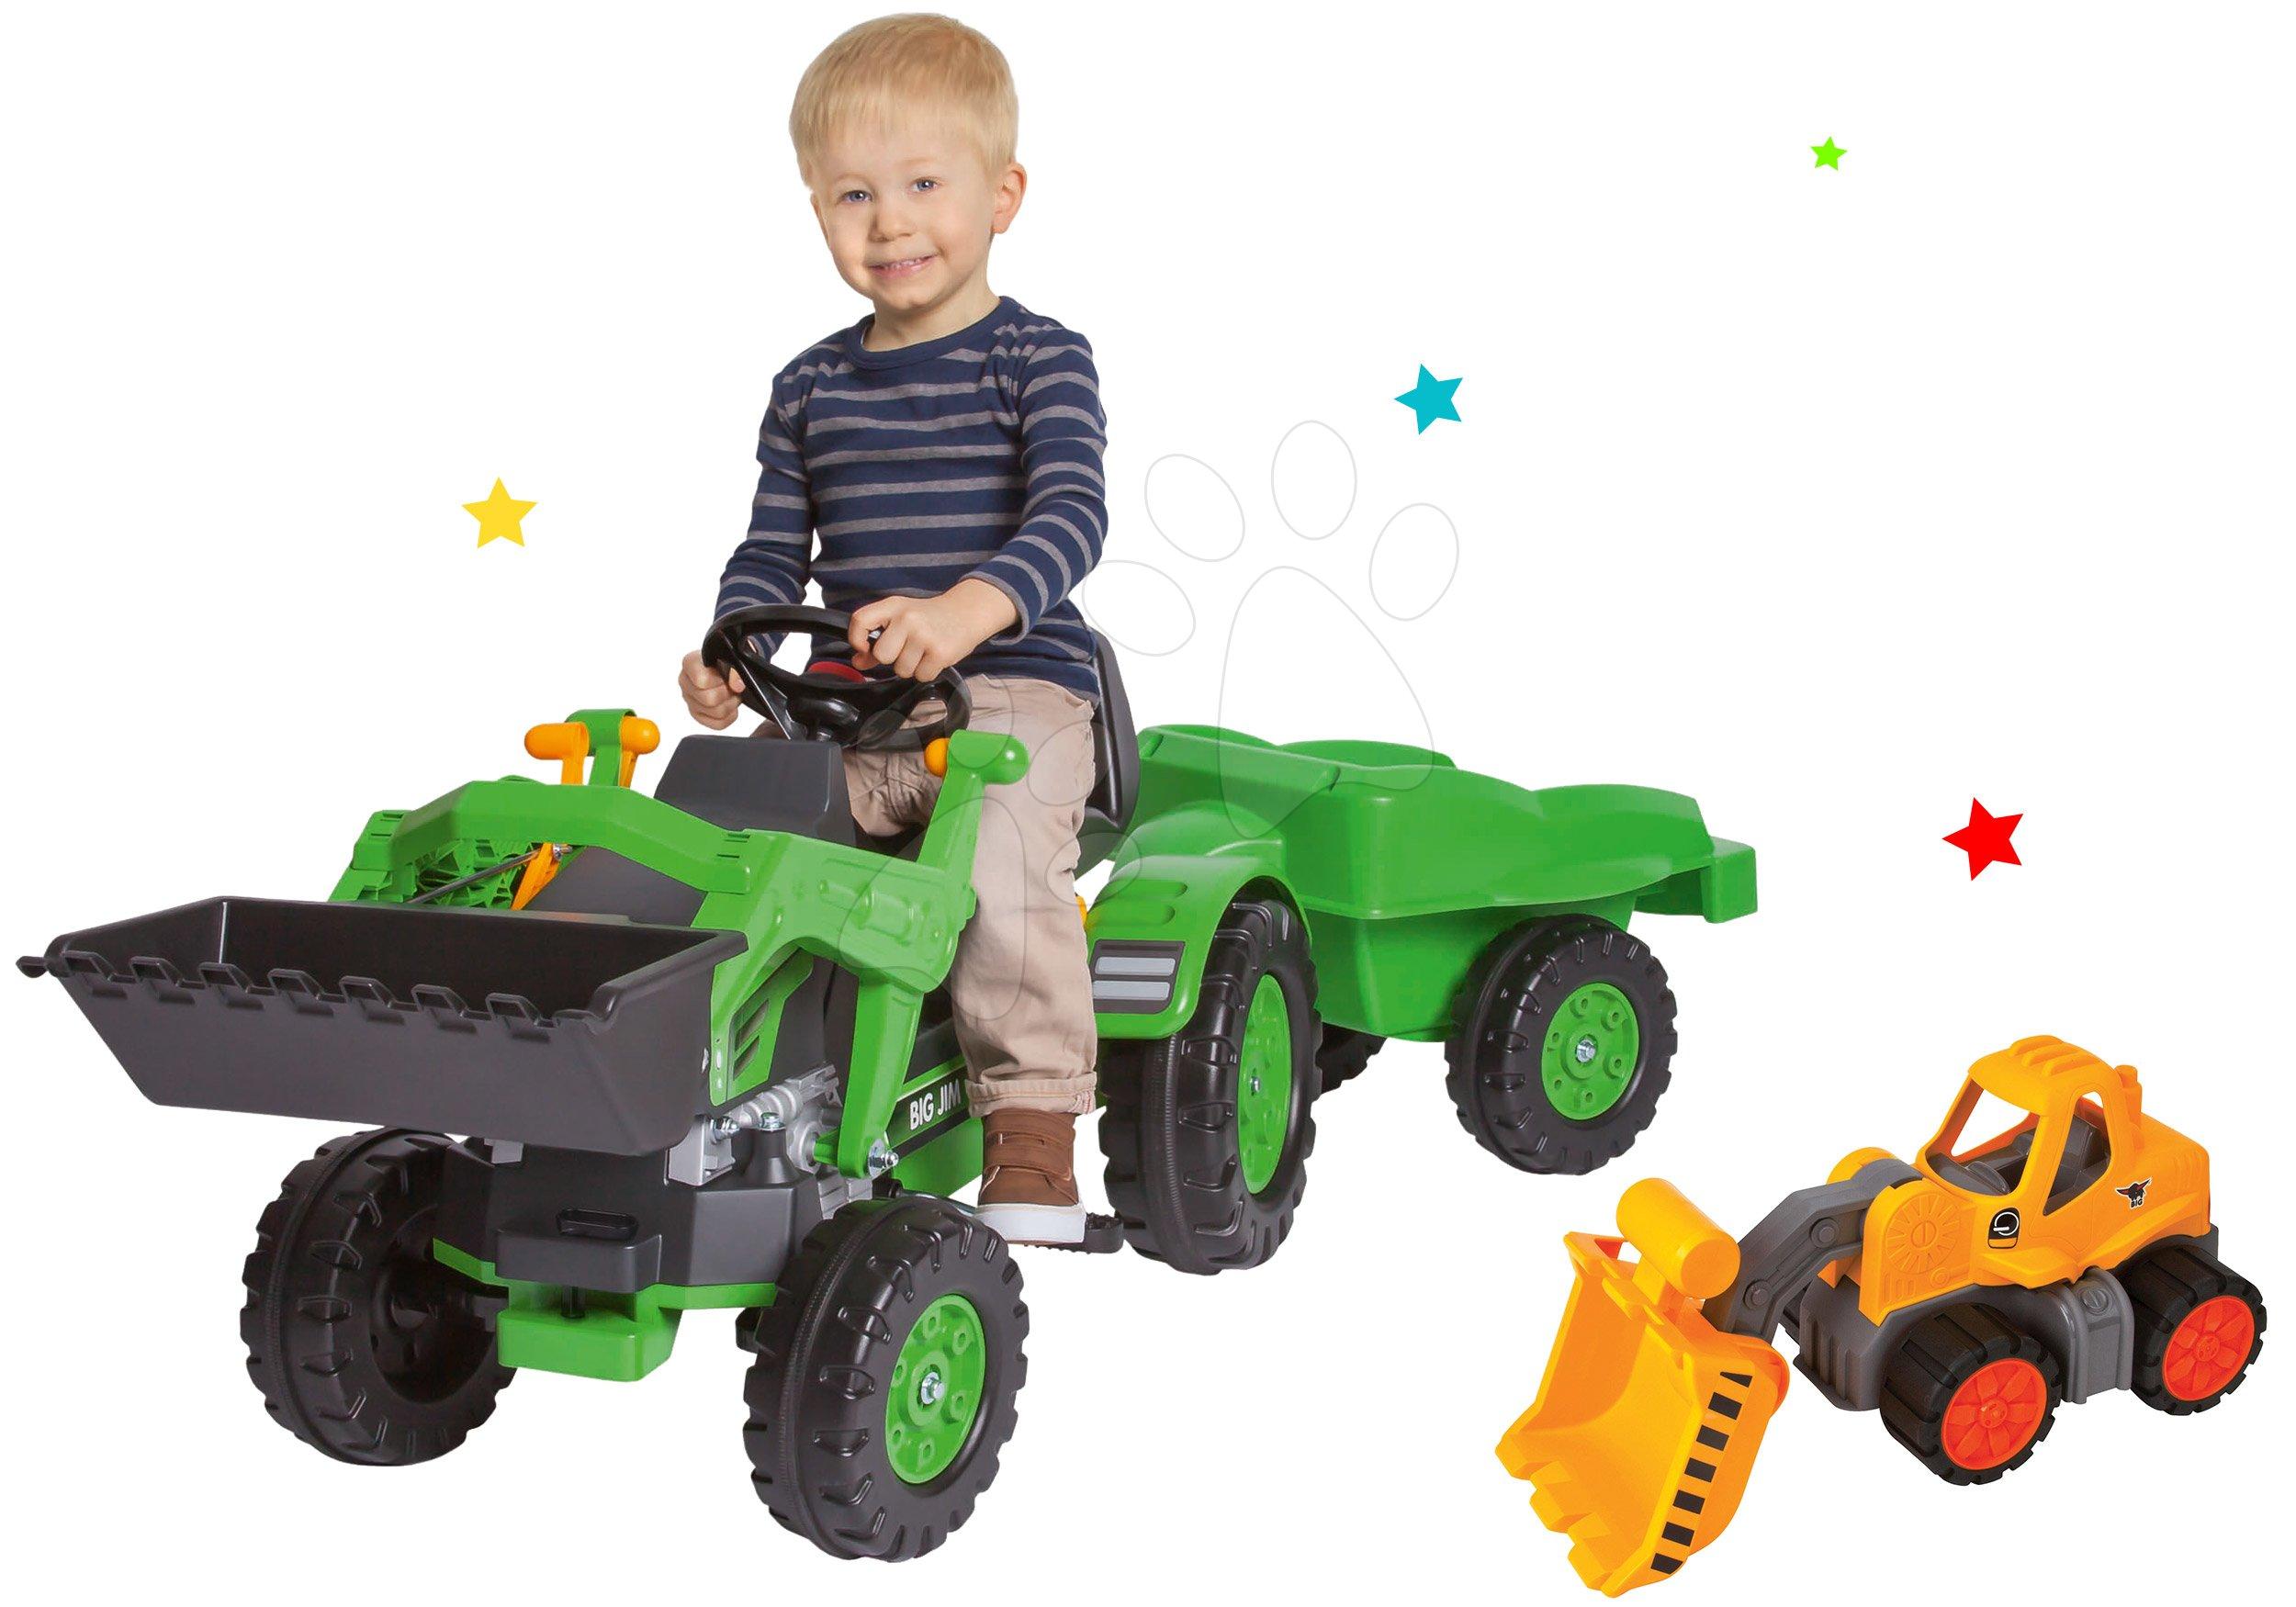 BIG set šliapací traktor Jim Loader s nakladačom a prívesom a traktor Power s nakladačom ako darček 56516-15